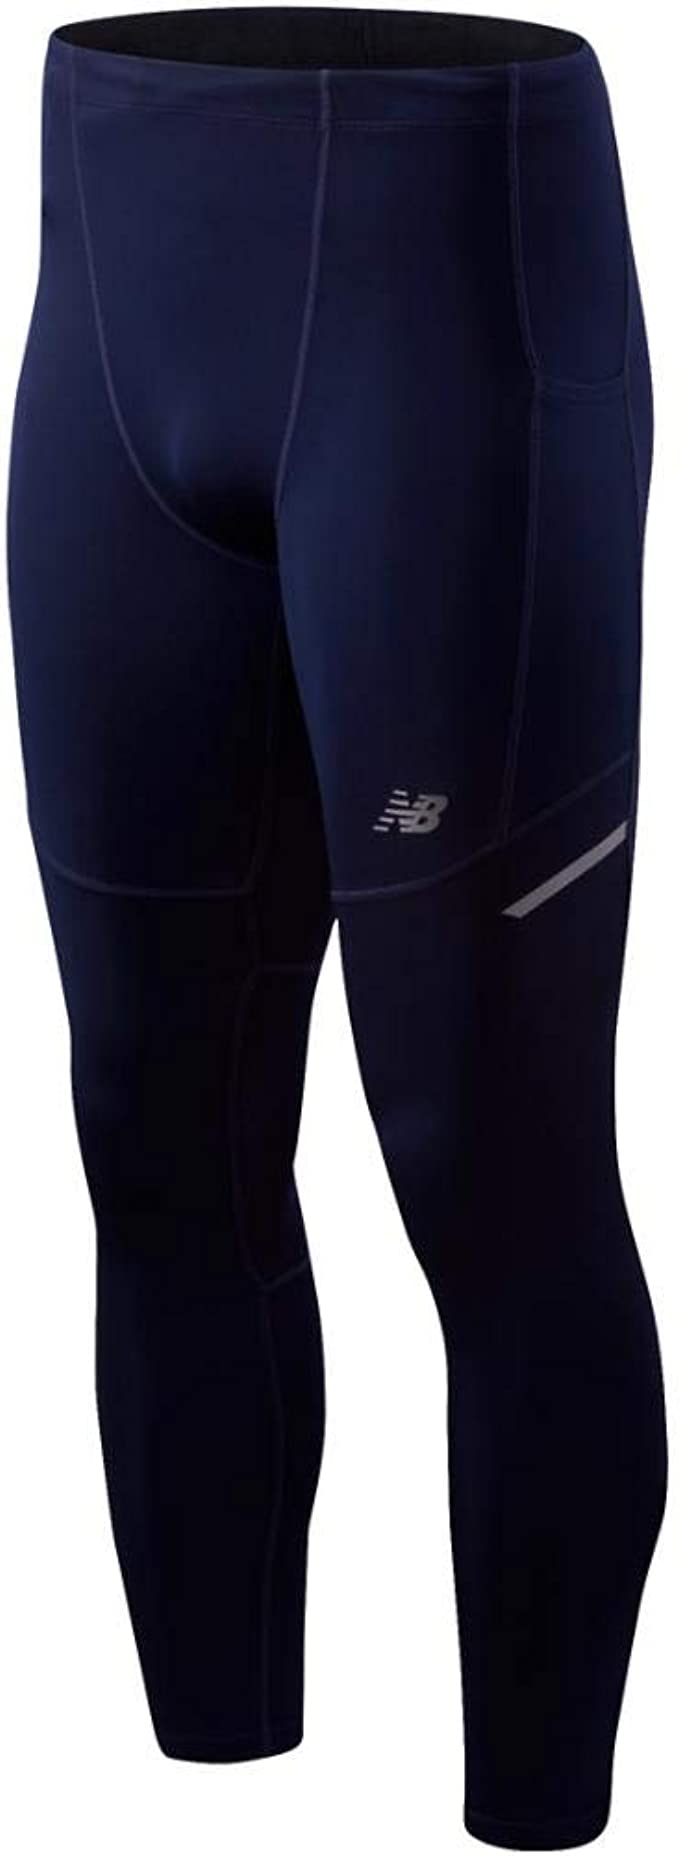 best men's running tights for winter